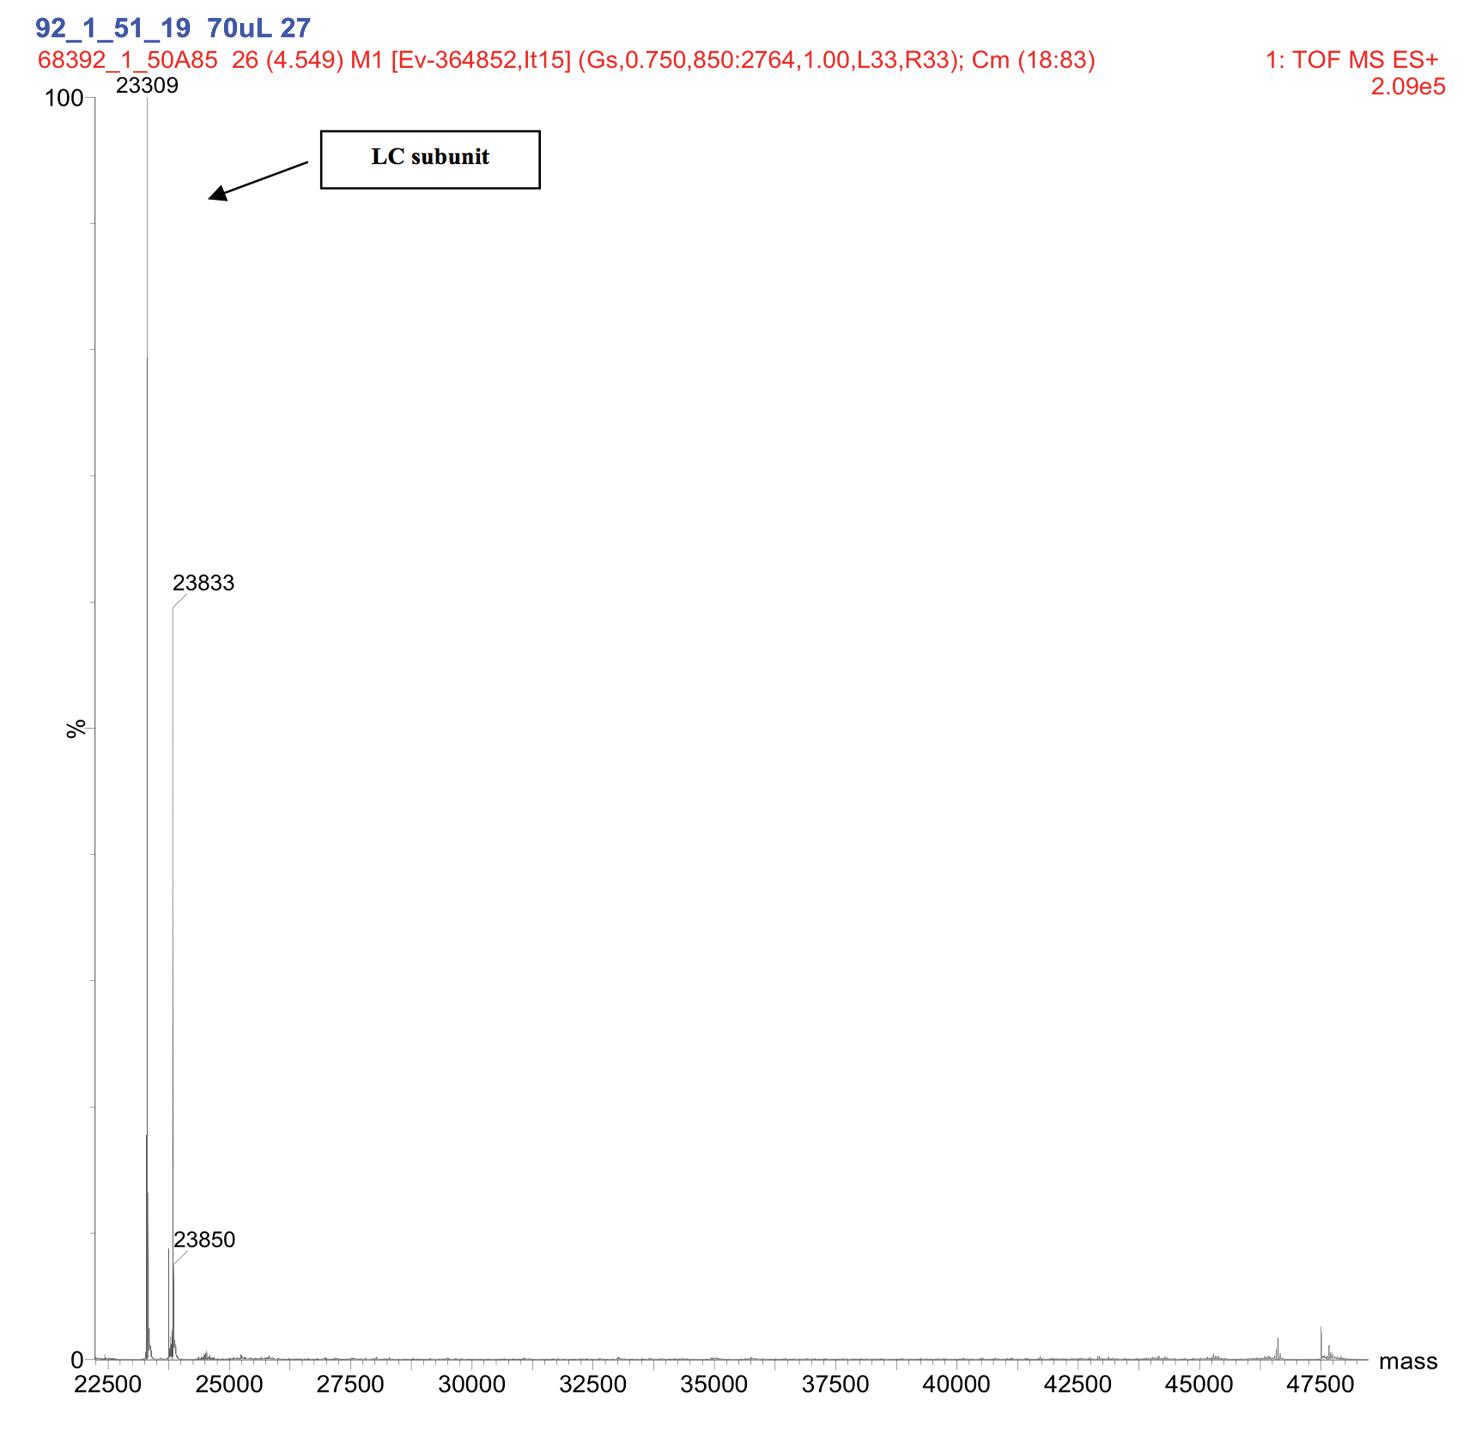 Figure 10. Representative Deconvoluted Mass Spectra of De3 at pk 20 min